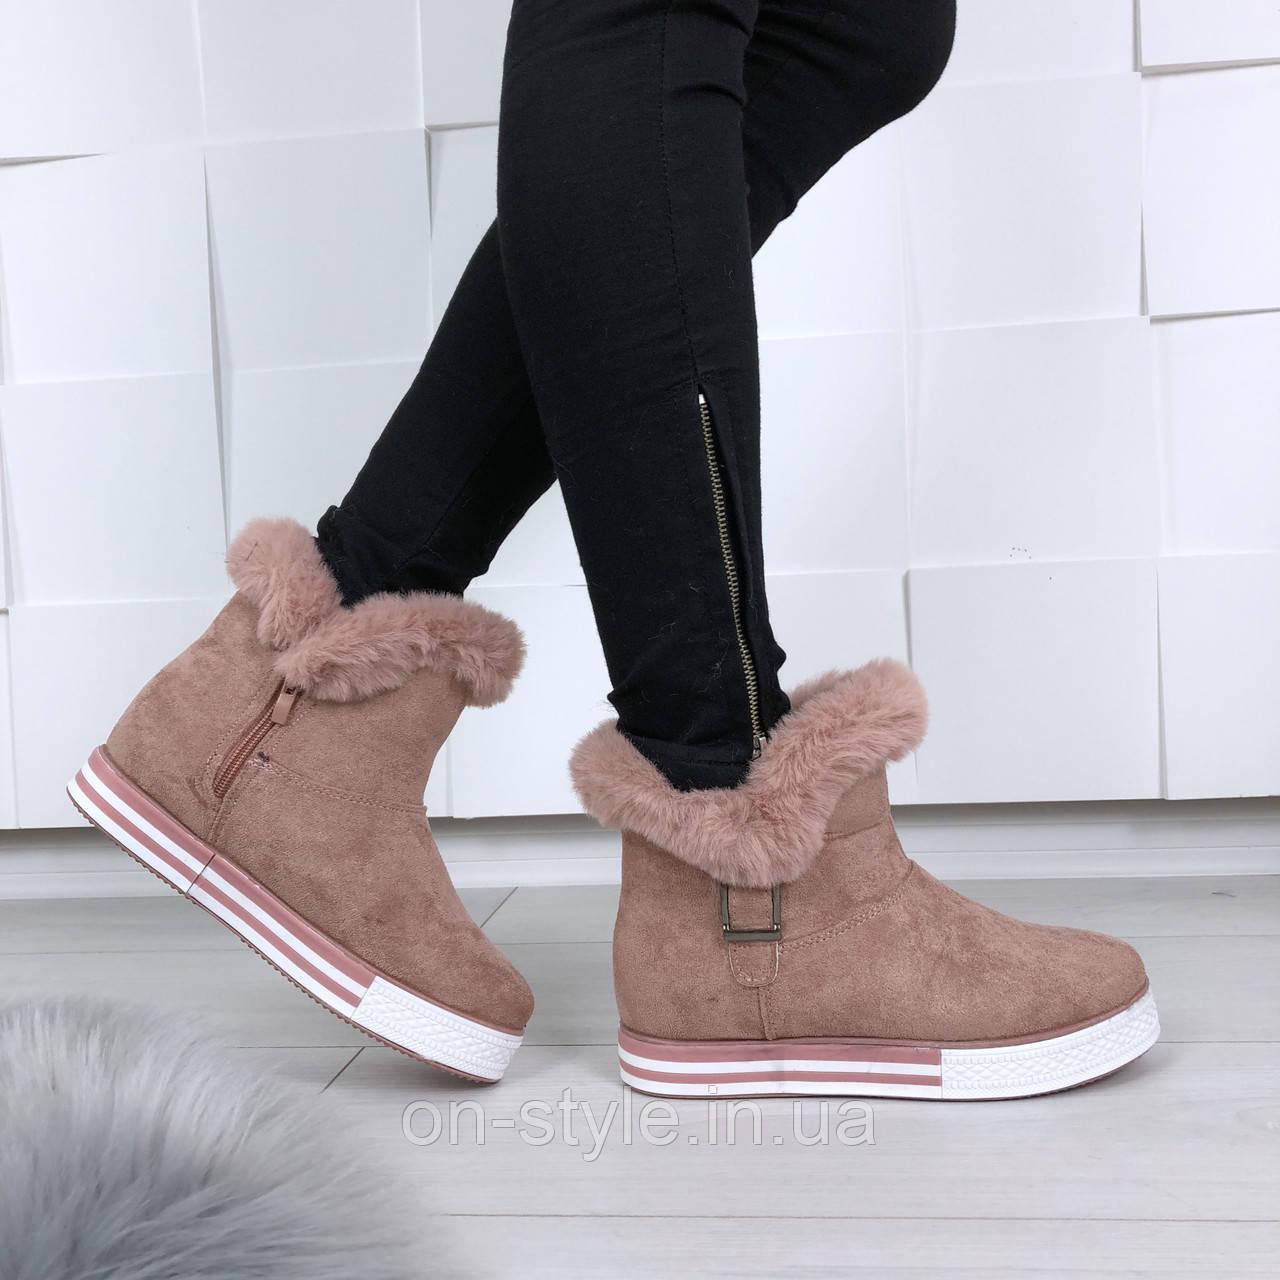 f286cf8f4 Женские розовые ботинки на спортивной подошве - Интернет-магазин